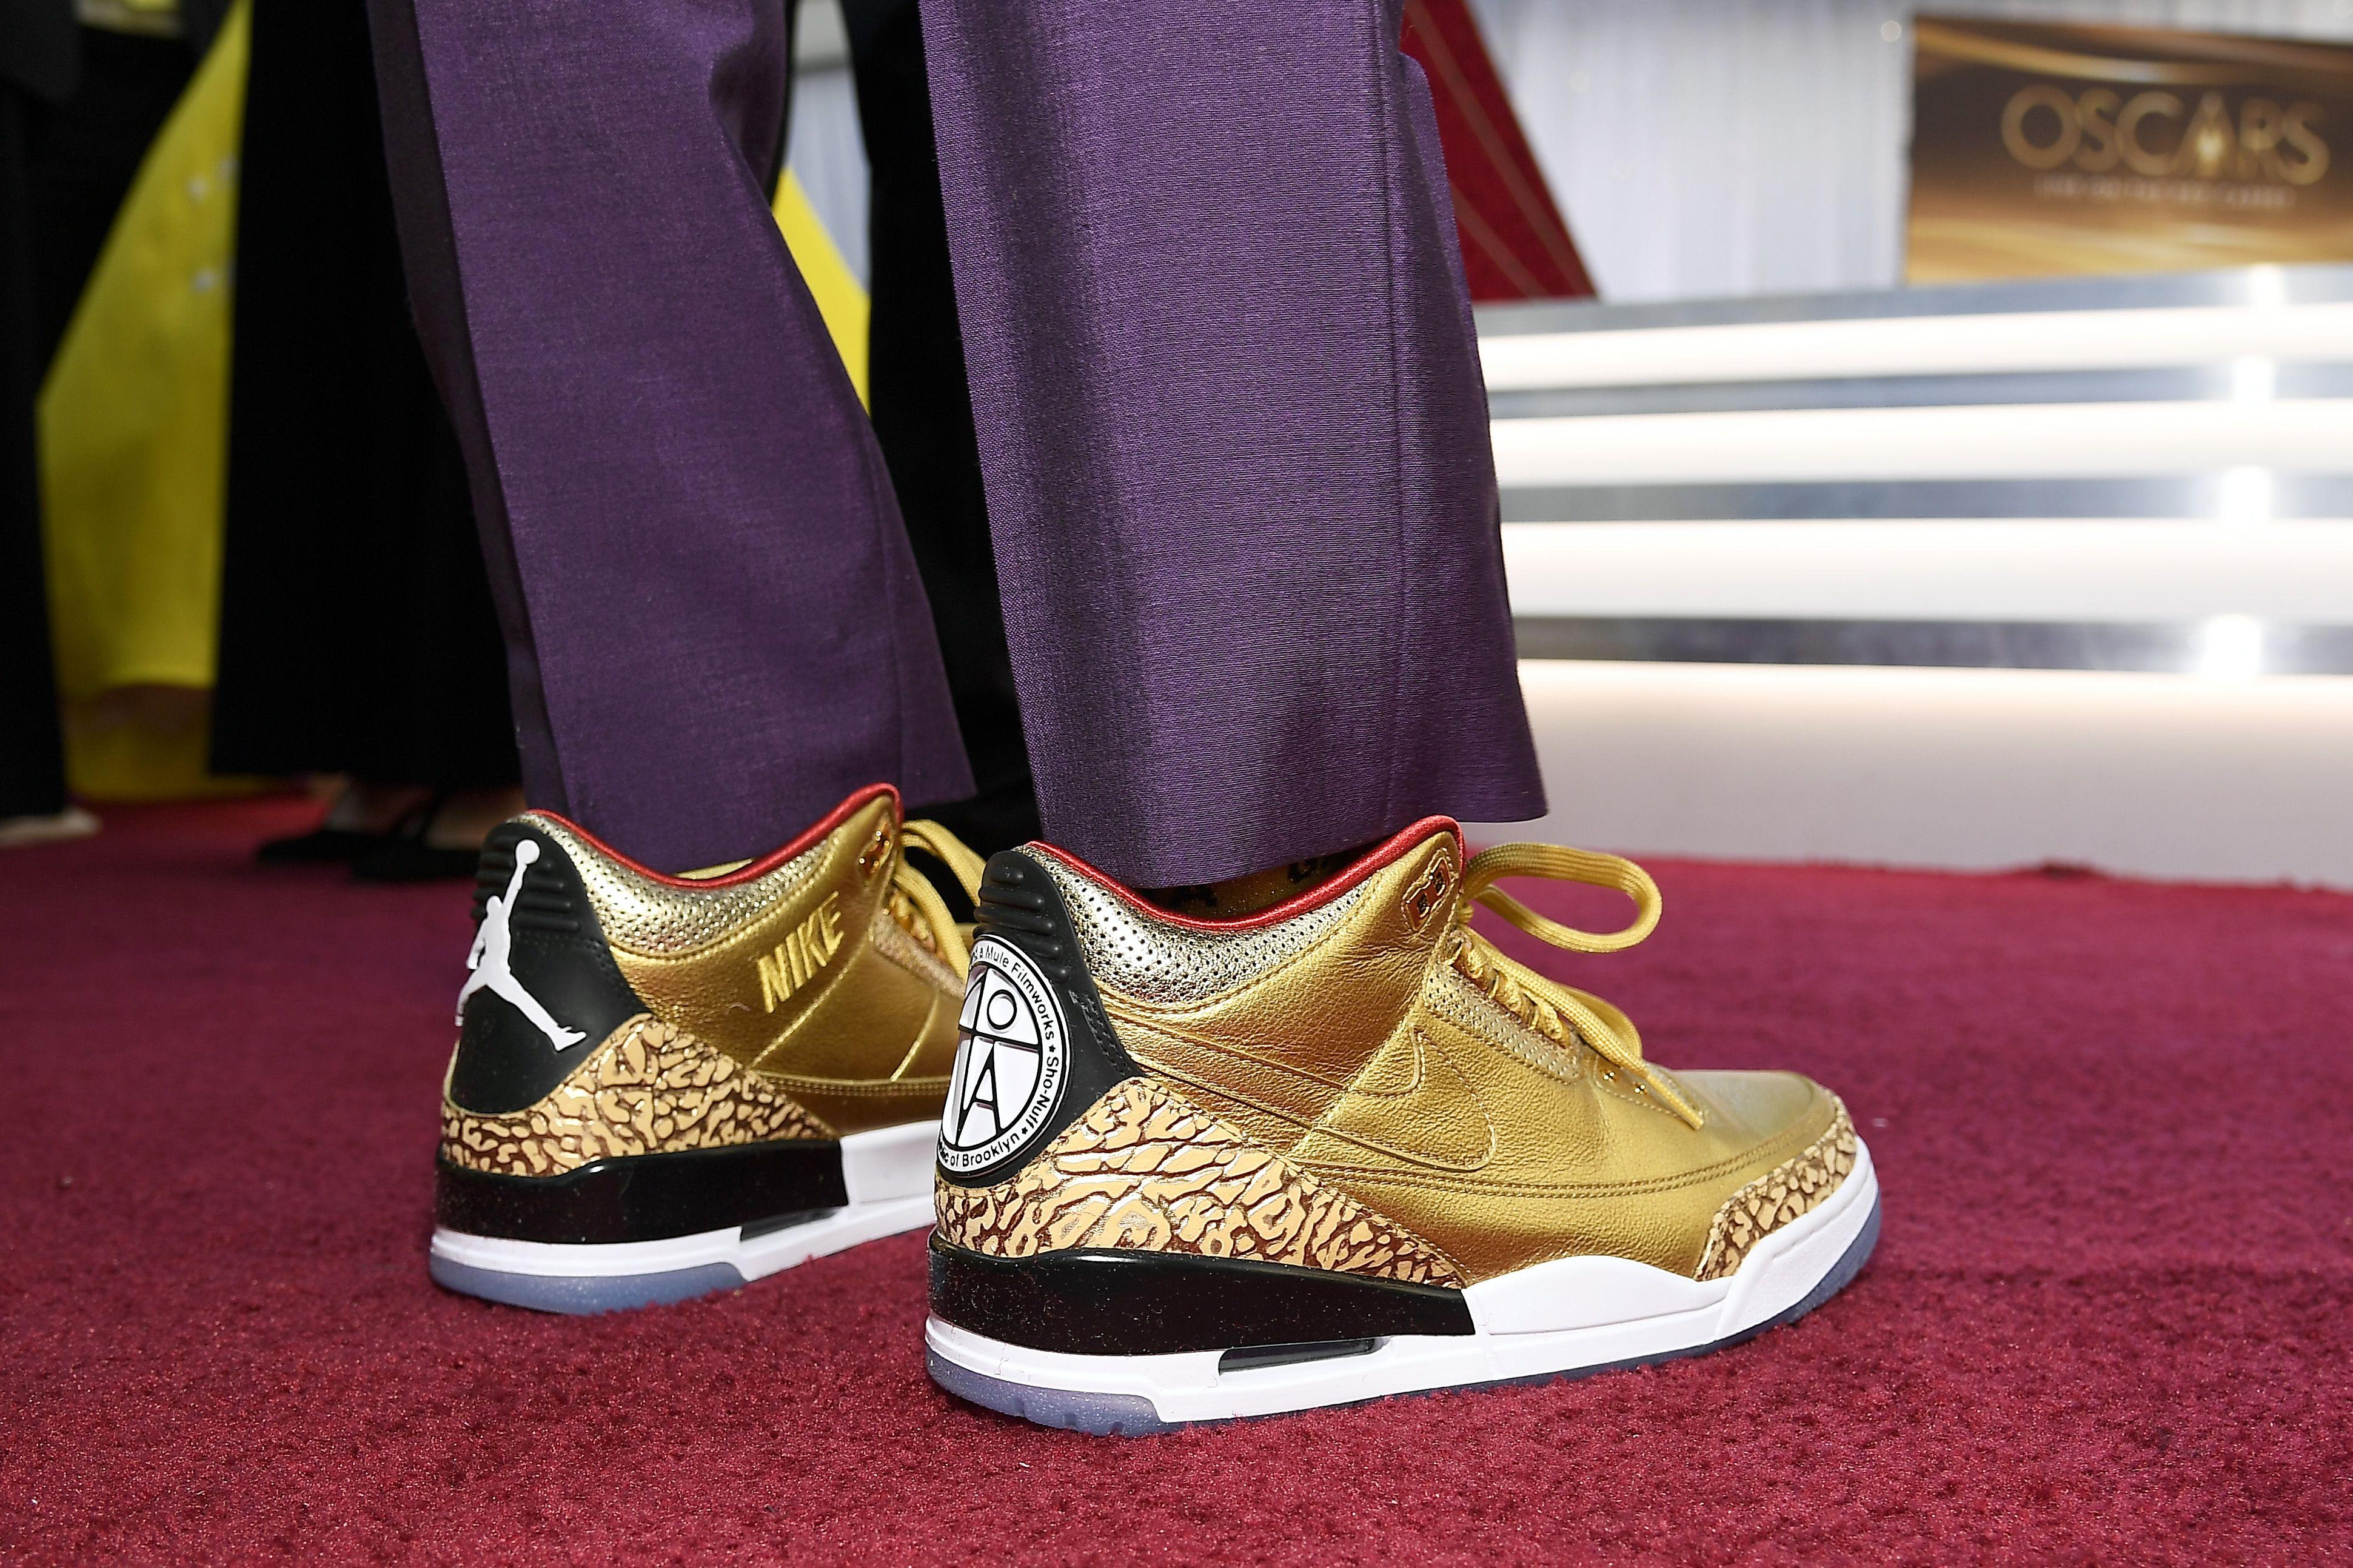 Spike Lee Wore Custom Gold Air Jordan 3